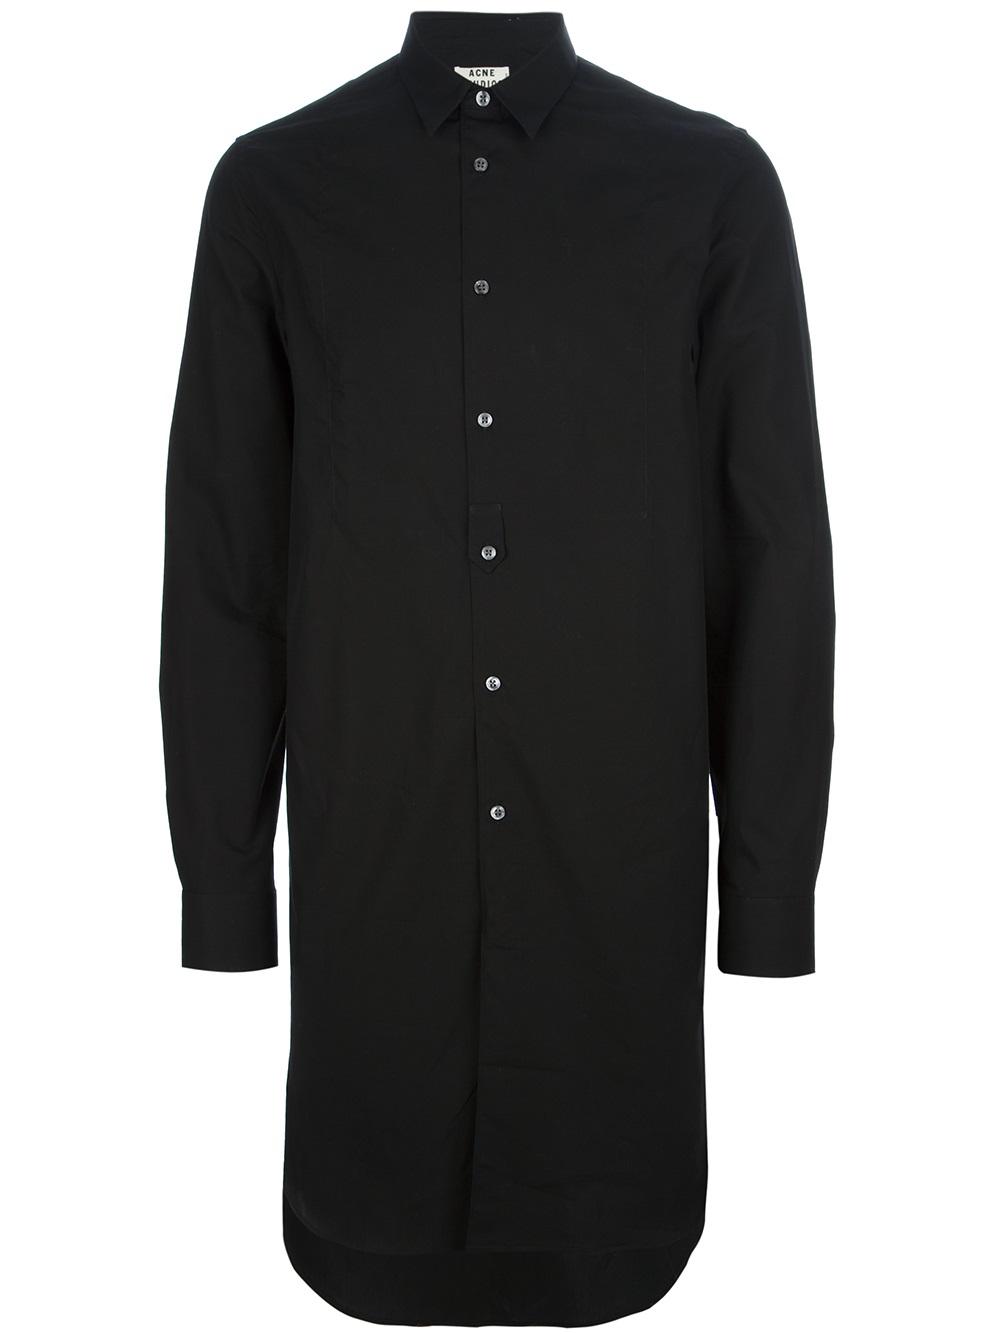 Acne Studios Jay Extra Long Shirt In Black For Men Lyst